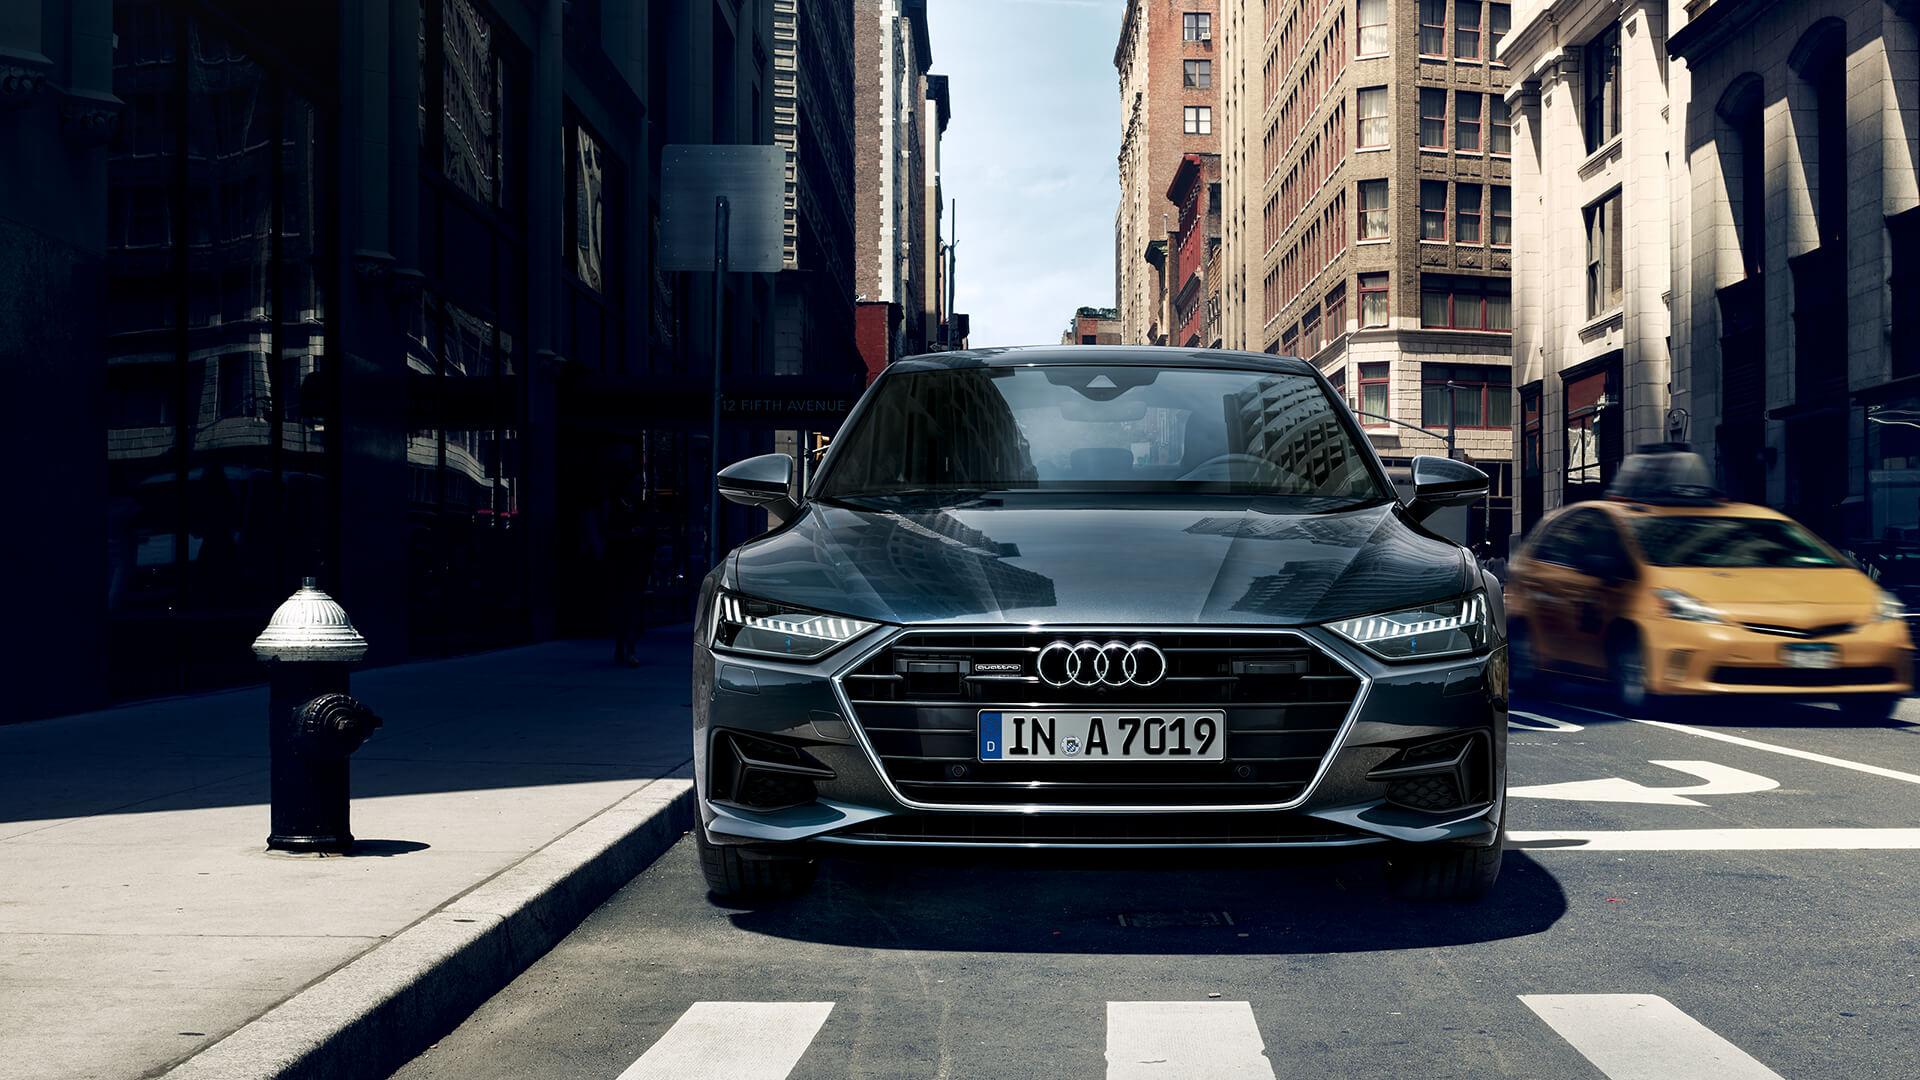 Audi A7 Audicom